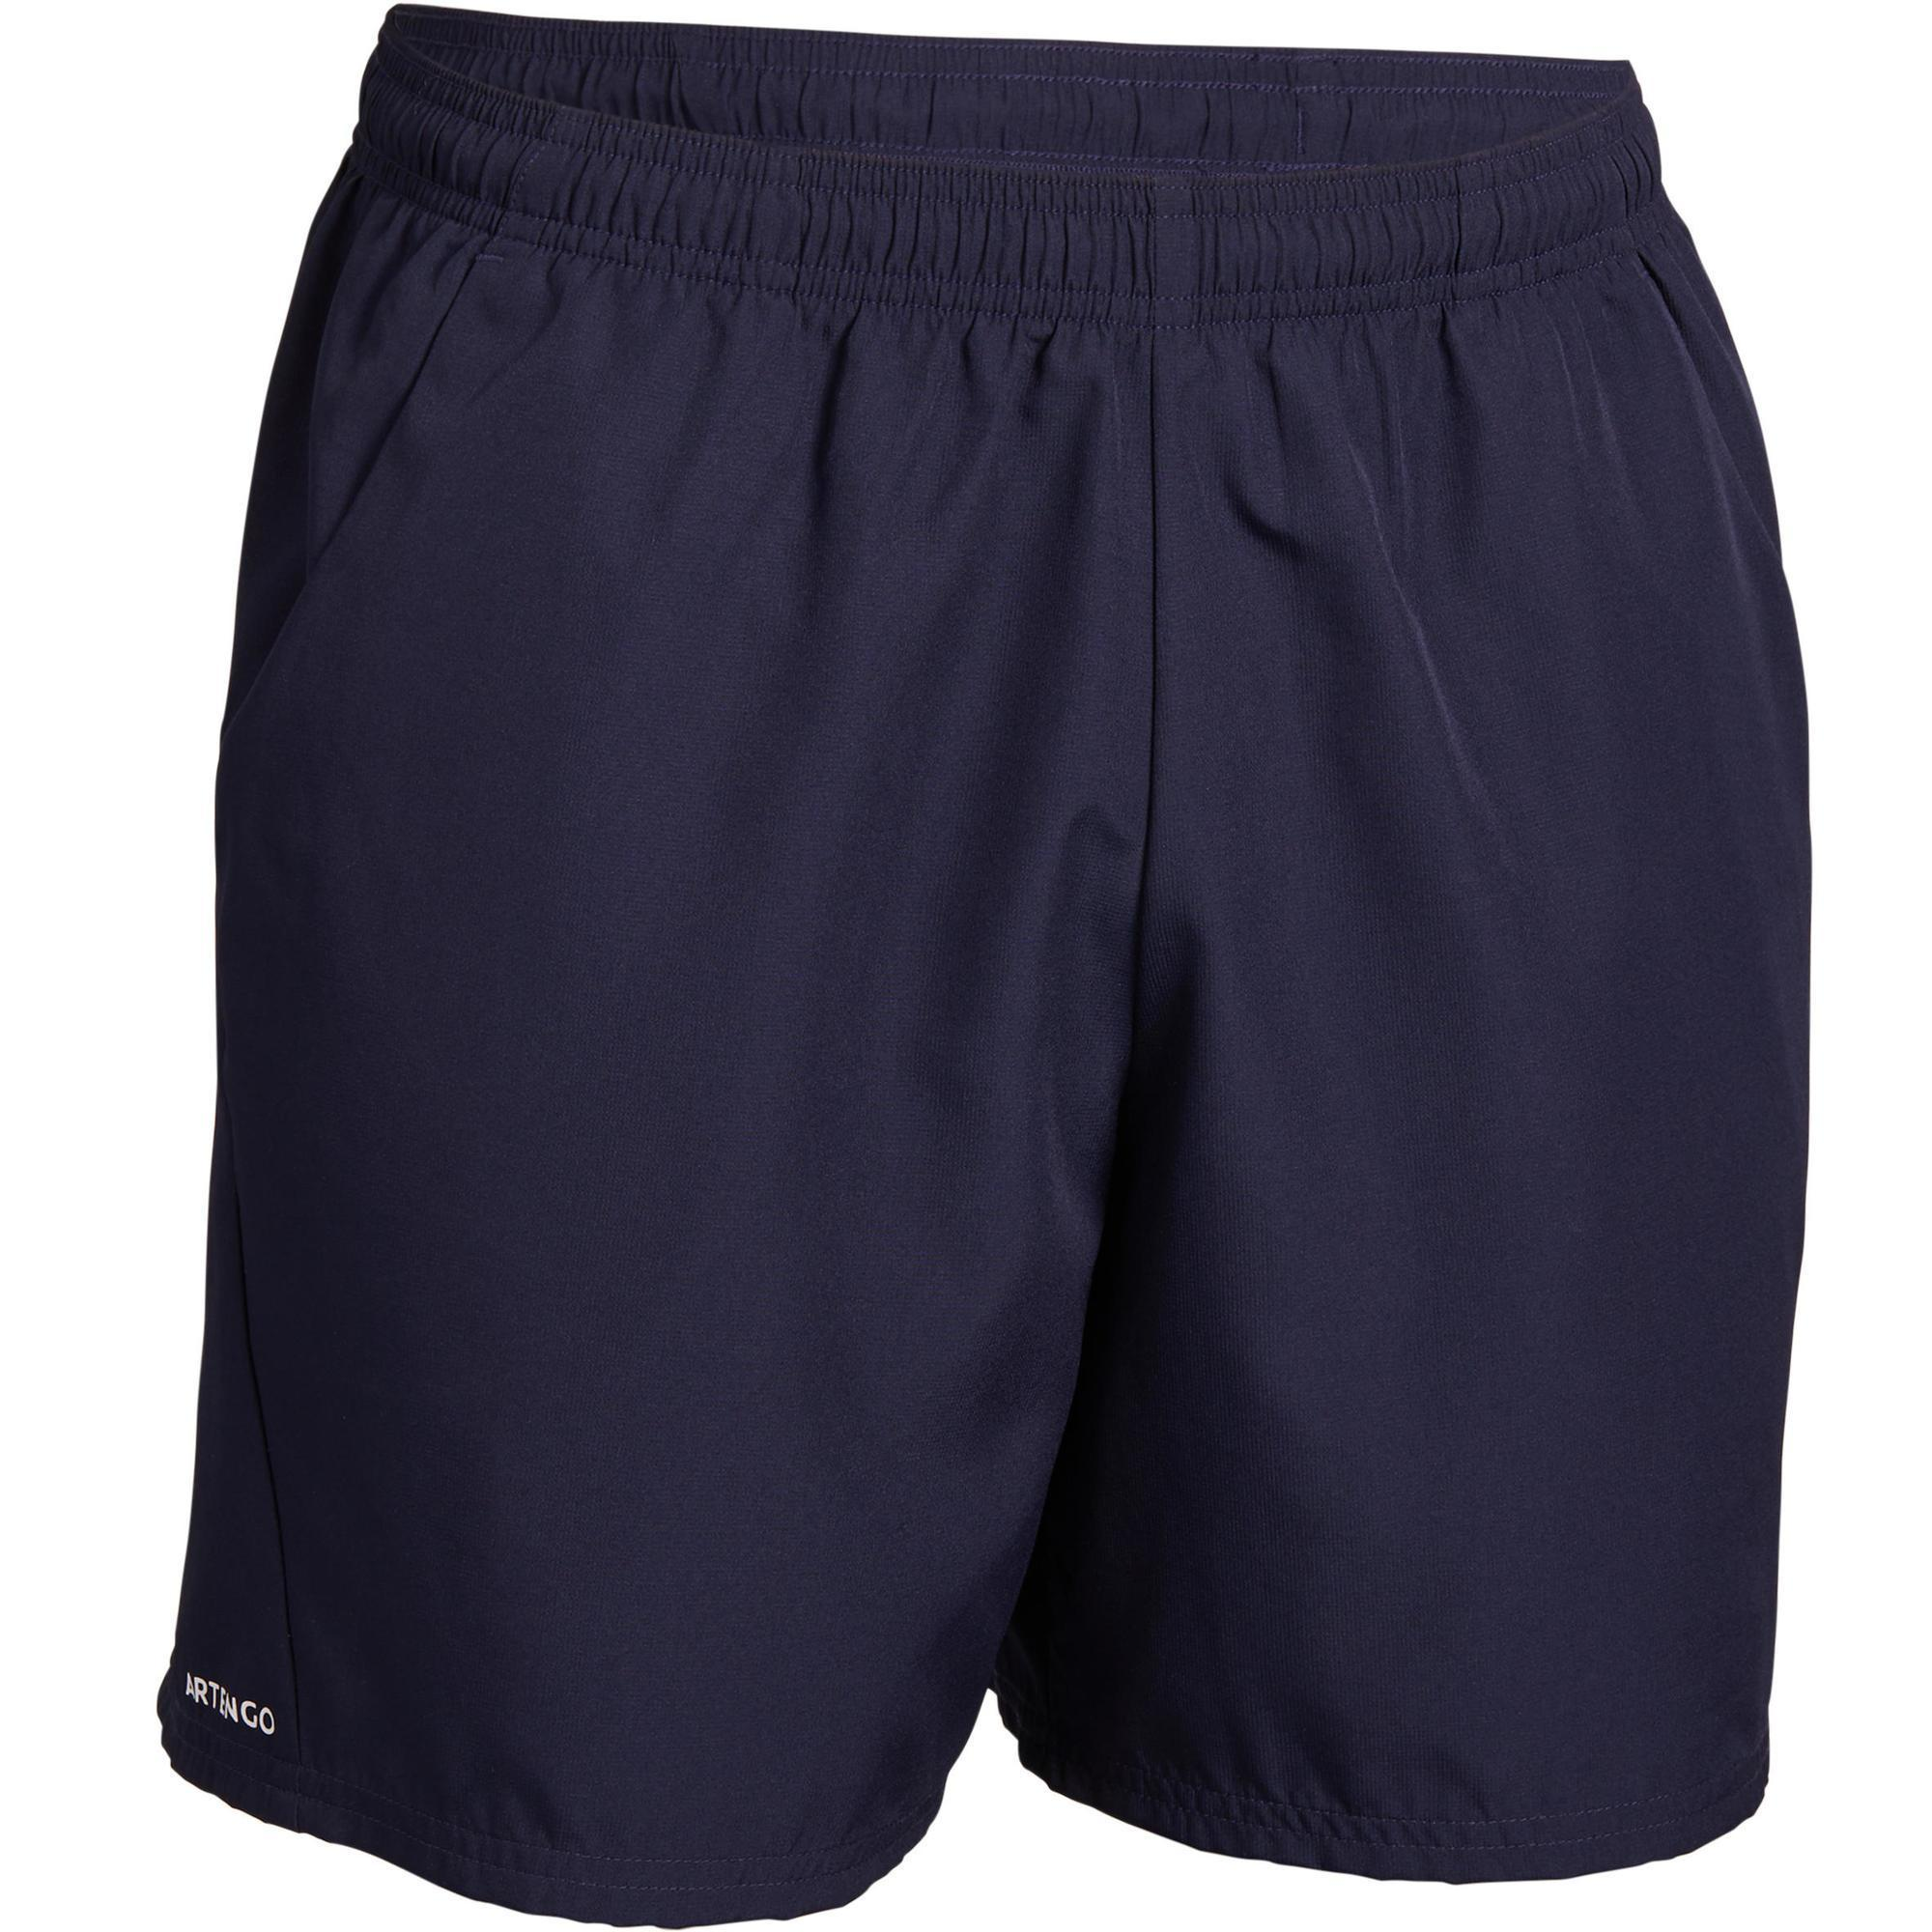 Tennisshorts Dry 100 Tennishose Herren | Sportbekleidung > Sporthosen > Tennisshorts | Artengo